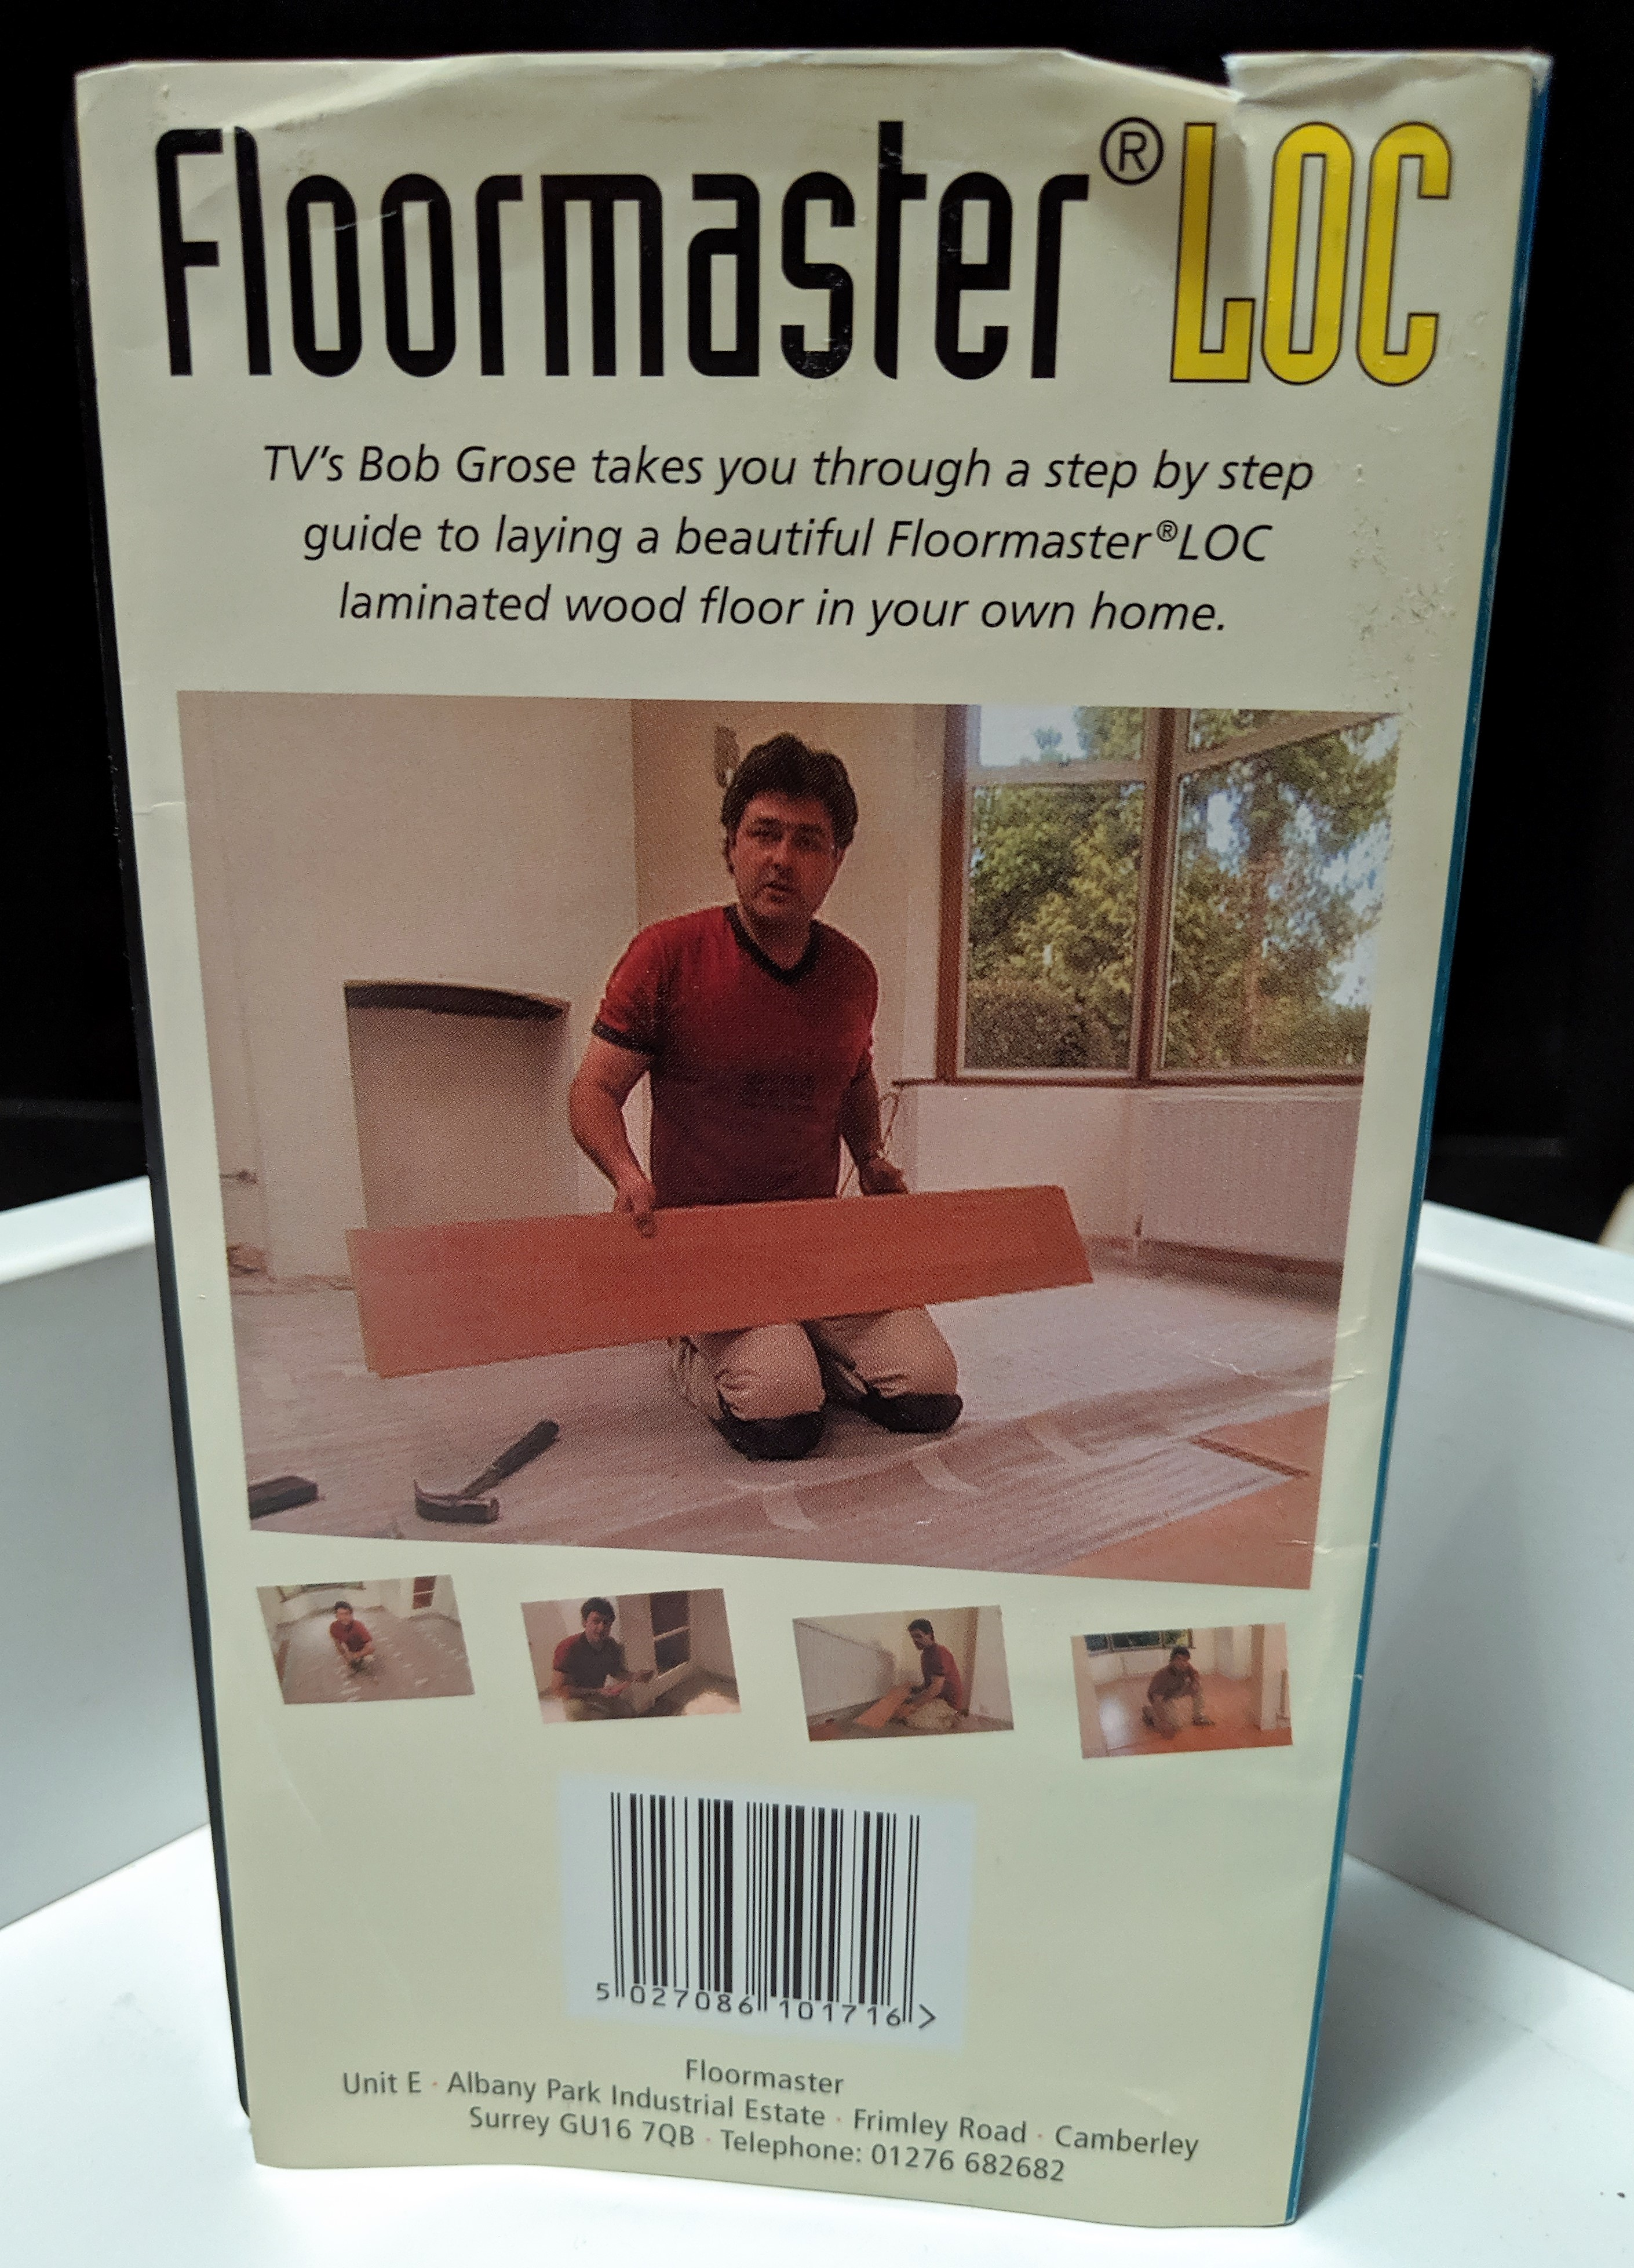 Floormaster LOC Back